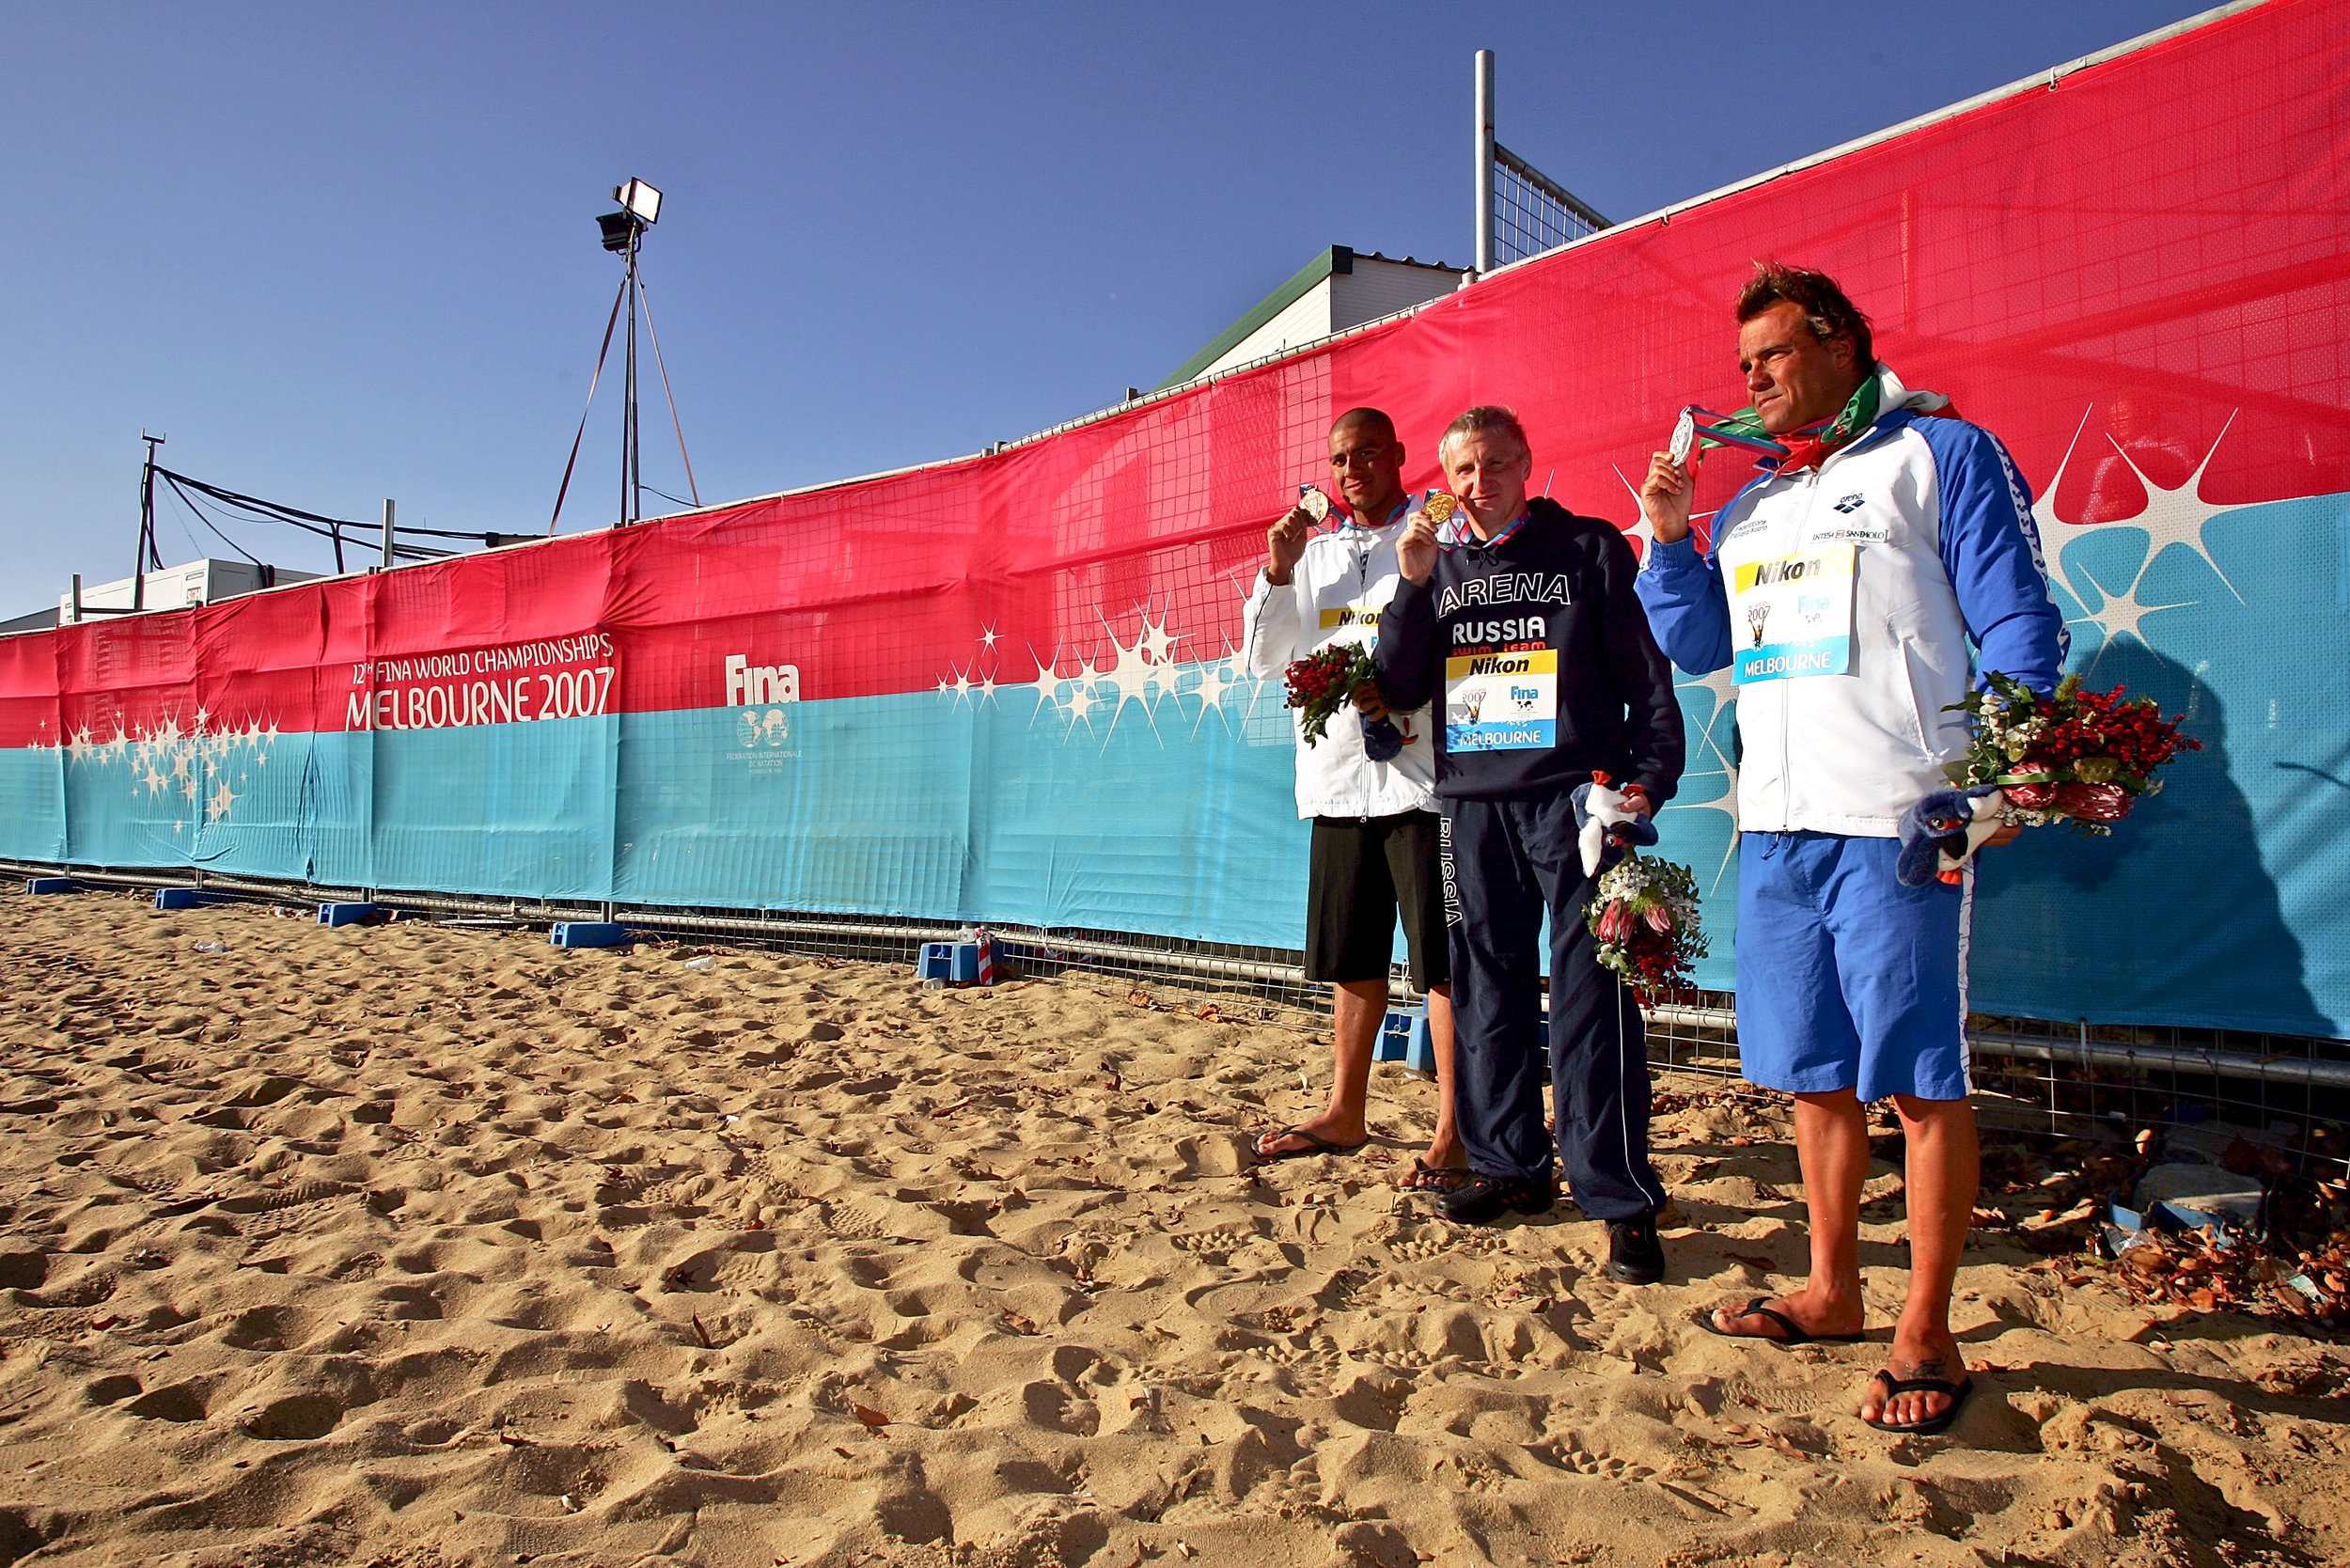 Hoarding-2007-World-Aquatics-Championships.jpg